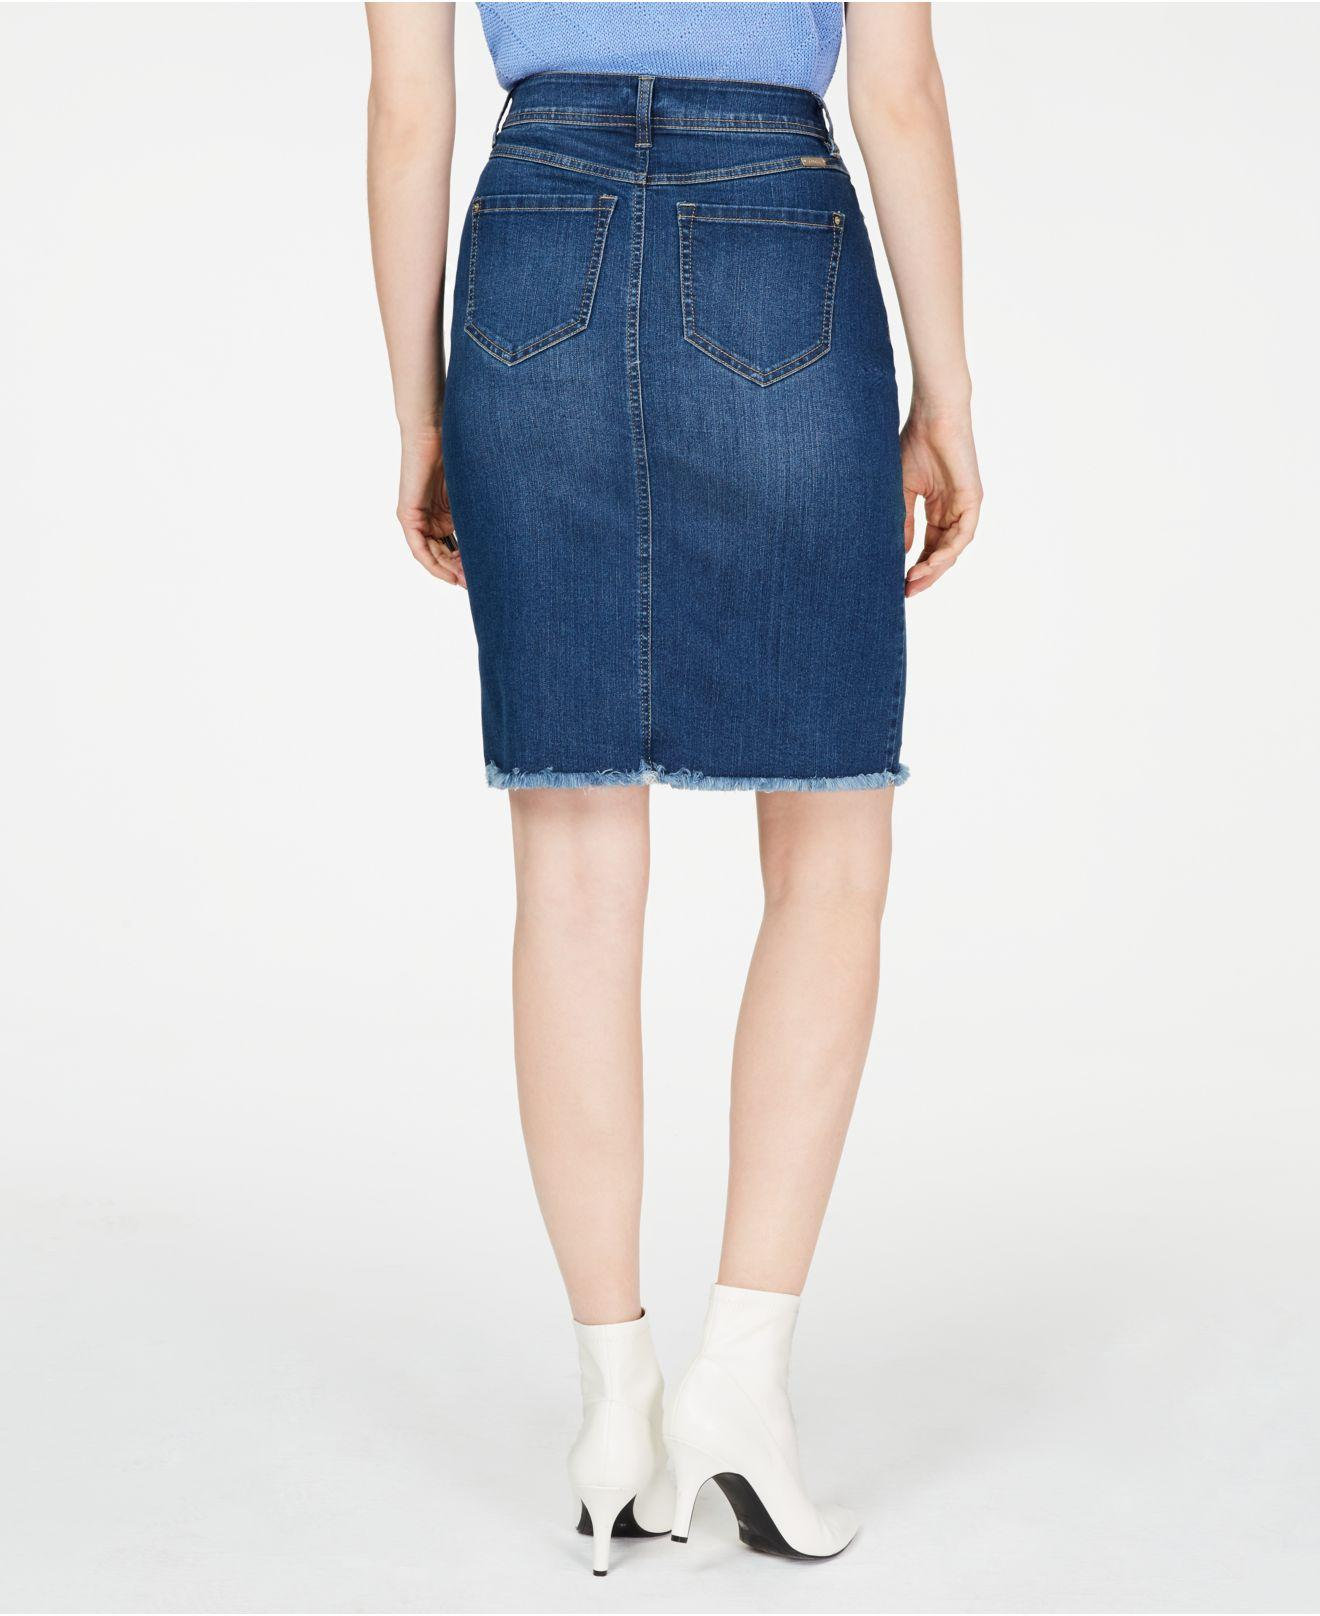 30b989cea Lyst - INC International Concepts I.n.c. Raw-edge Jean Skirt, Created For  Macy's in Blue